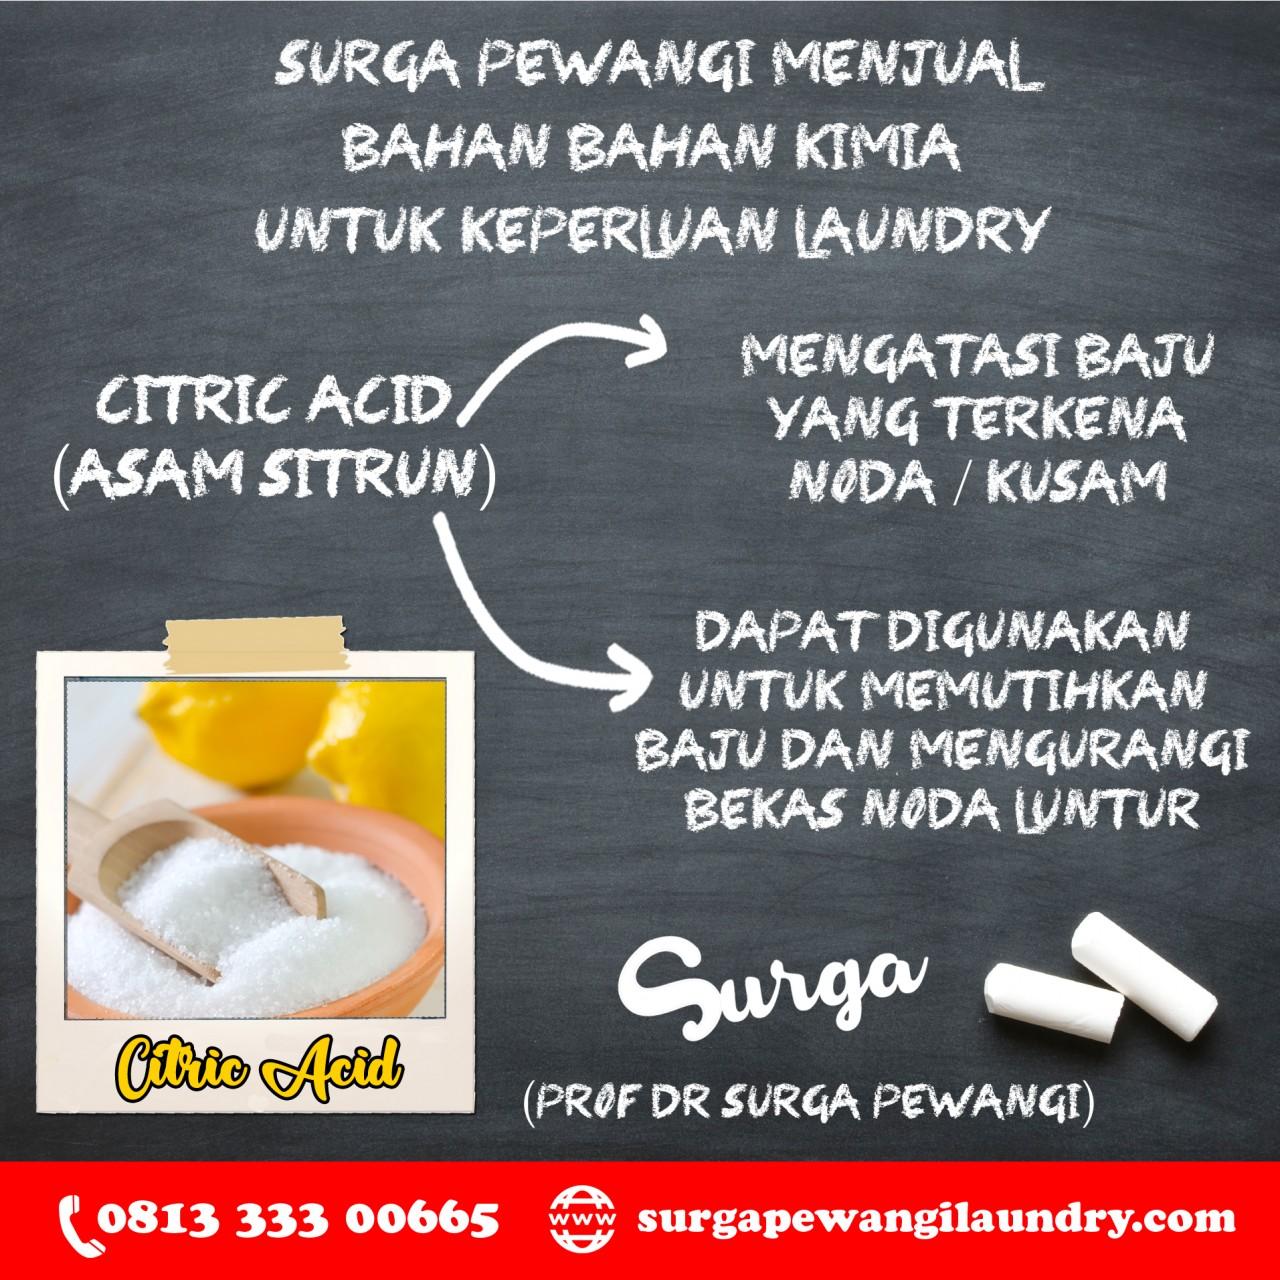 Citric Acid 1280x1280 - Deterjen Laundry Hotel - Rahasia Baju Rapih Wangi Mewah